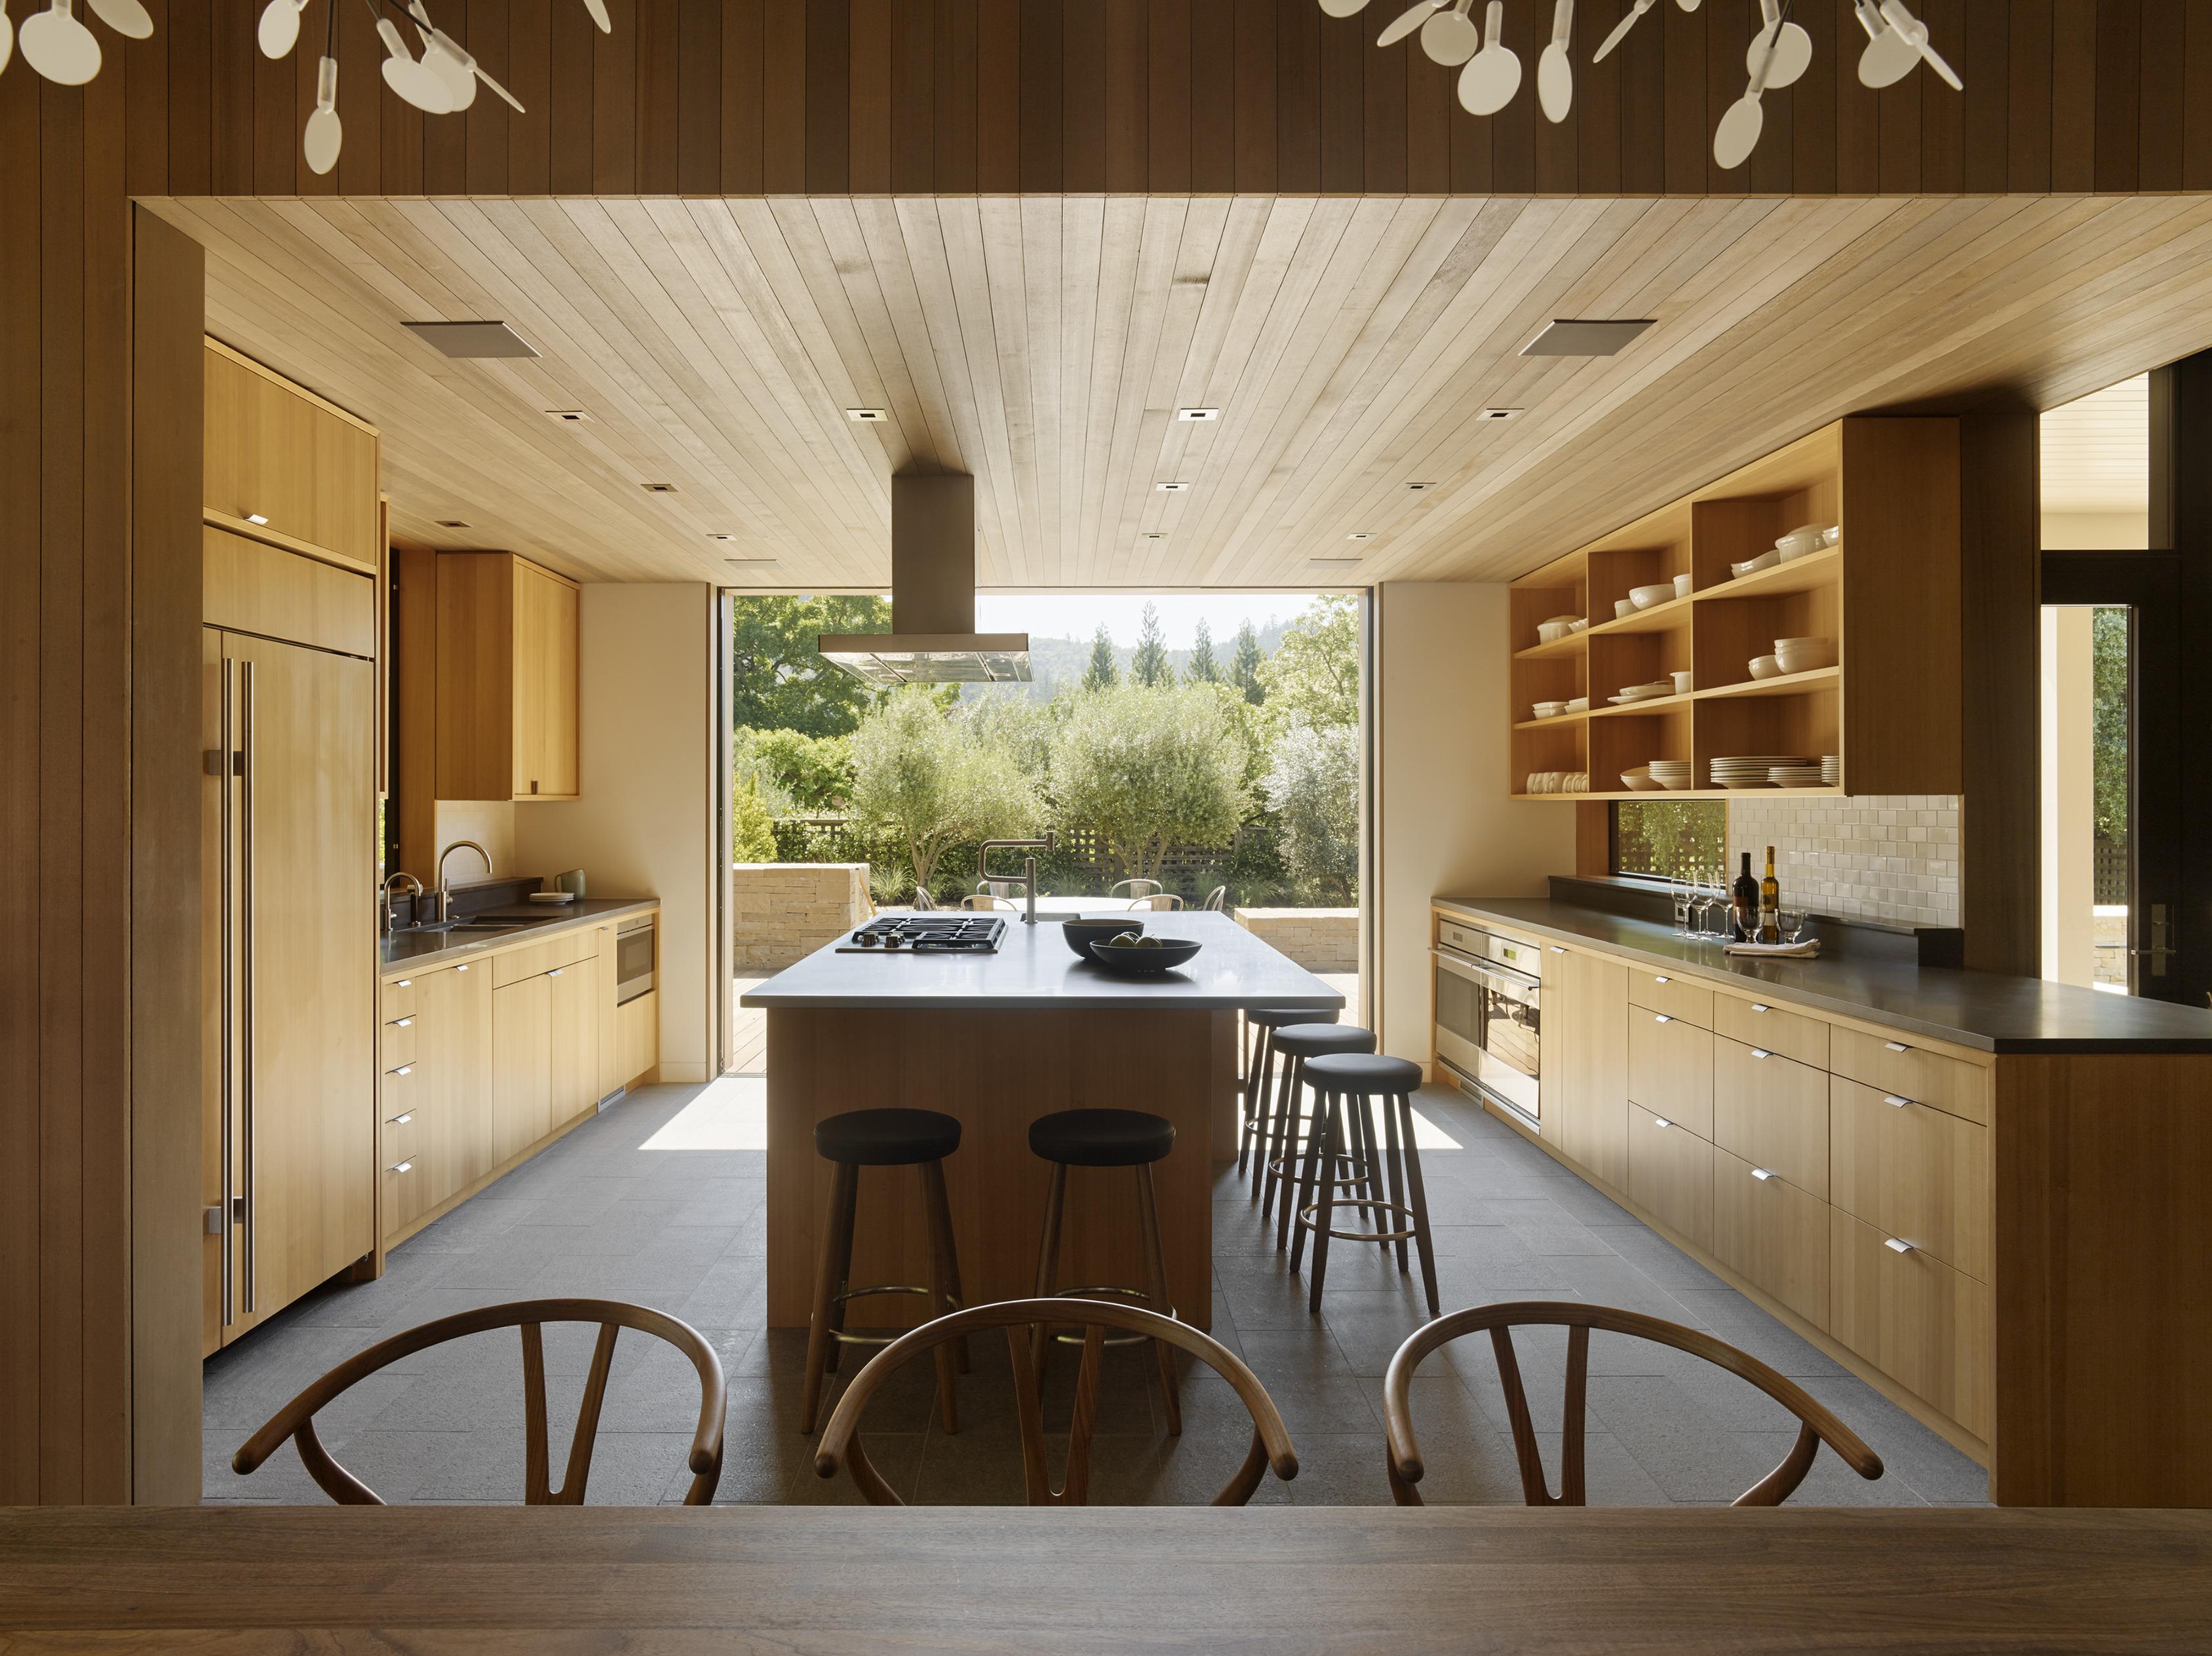 Wine Country Farmhouse in Calistoga, CA by Bohlin Cywinski Jackson